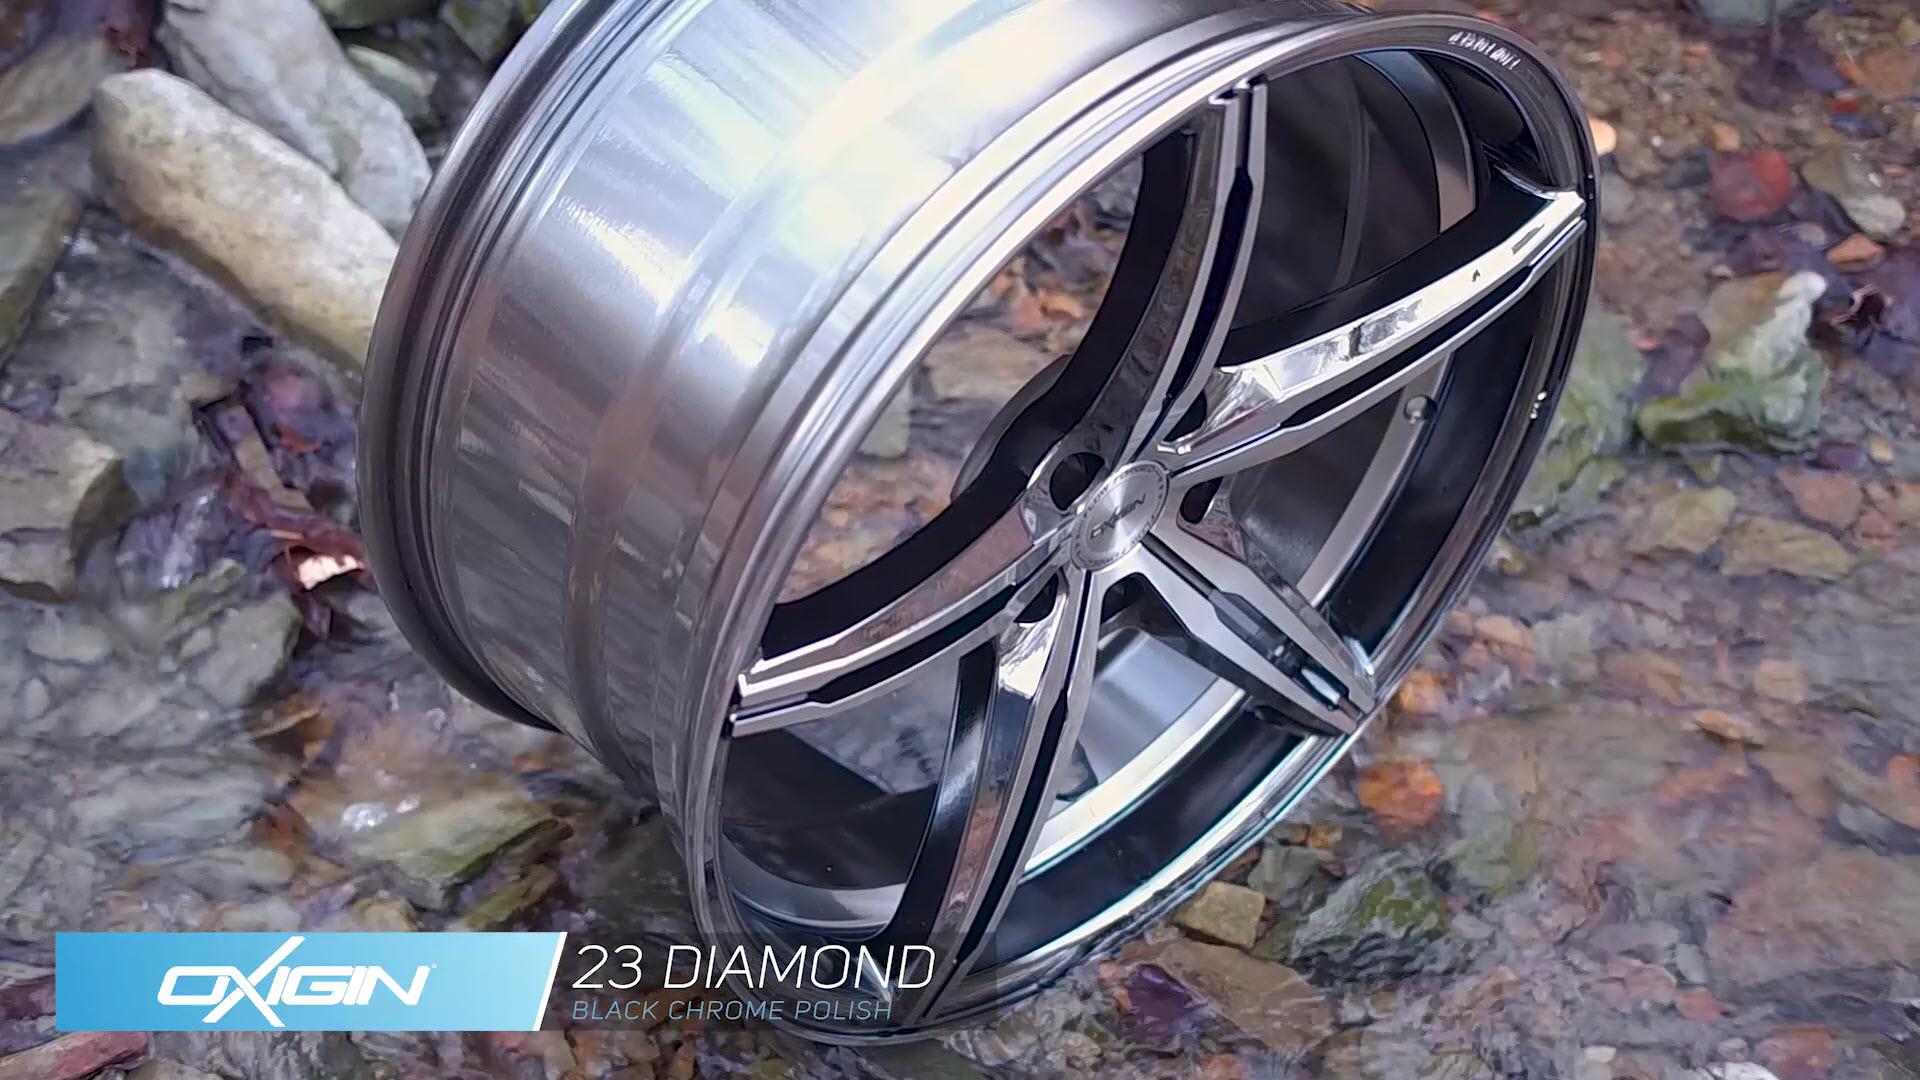 OX 23 Diamond Black Chrome Polish und Ambiente